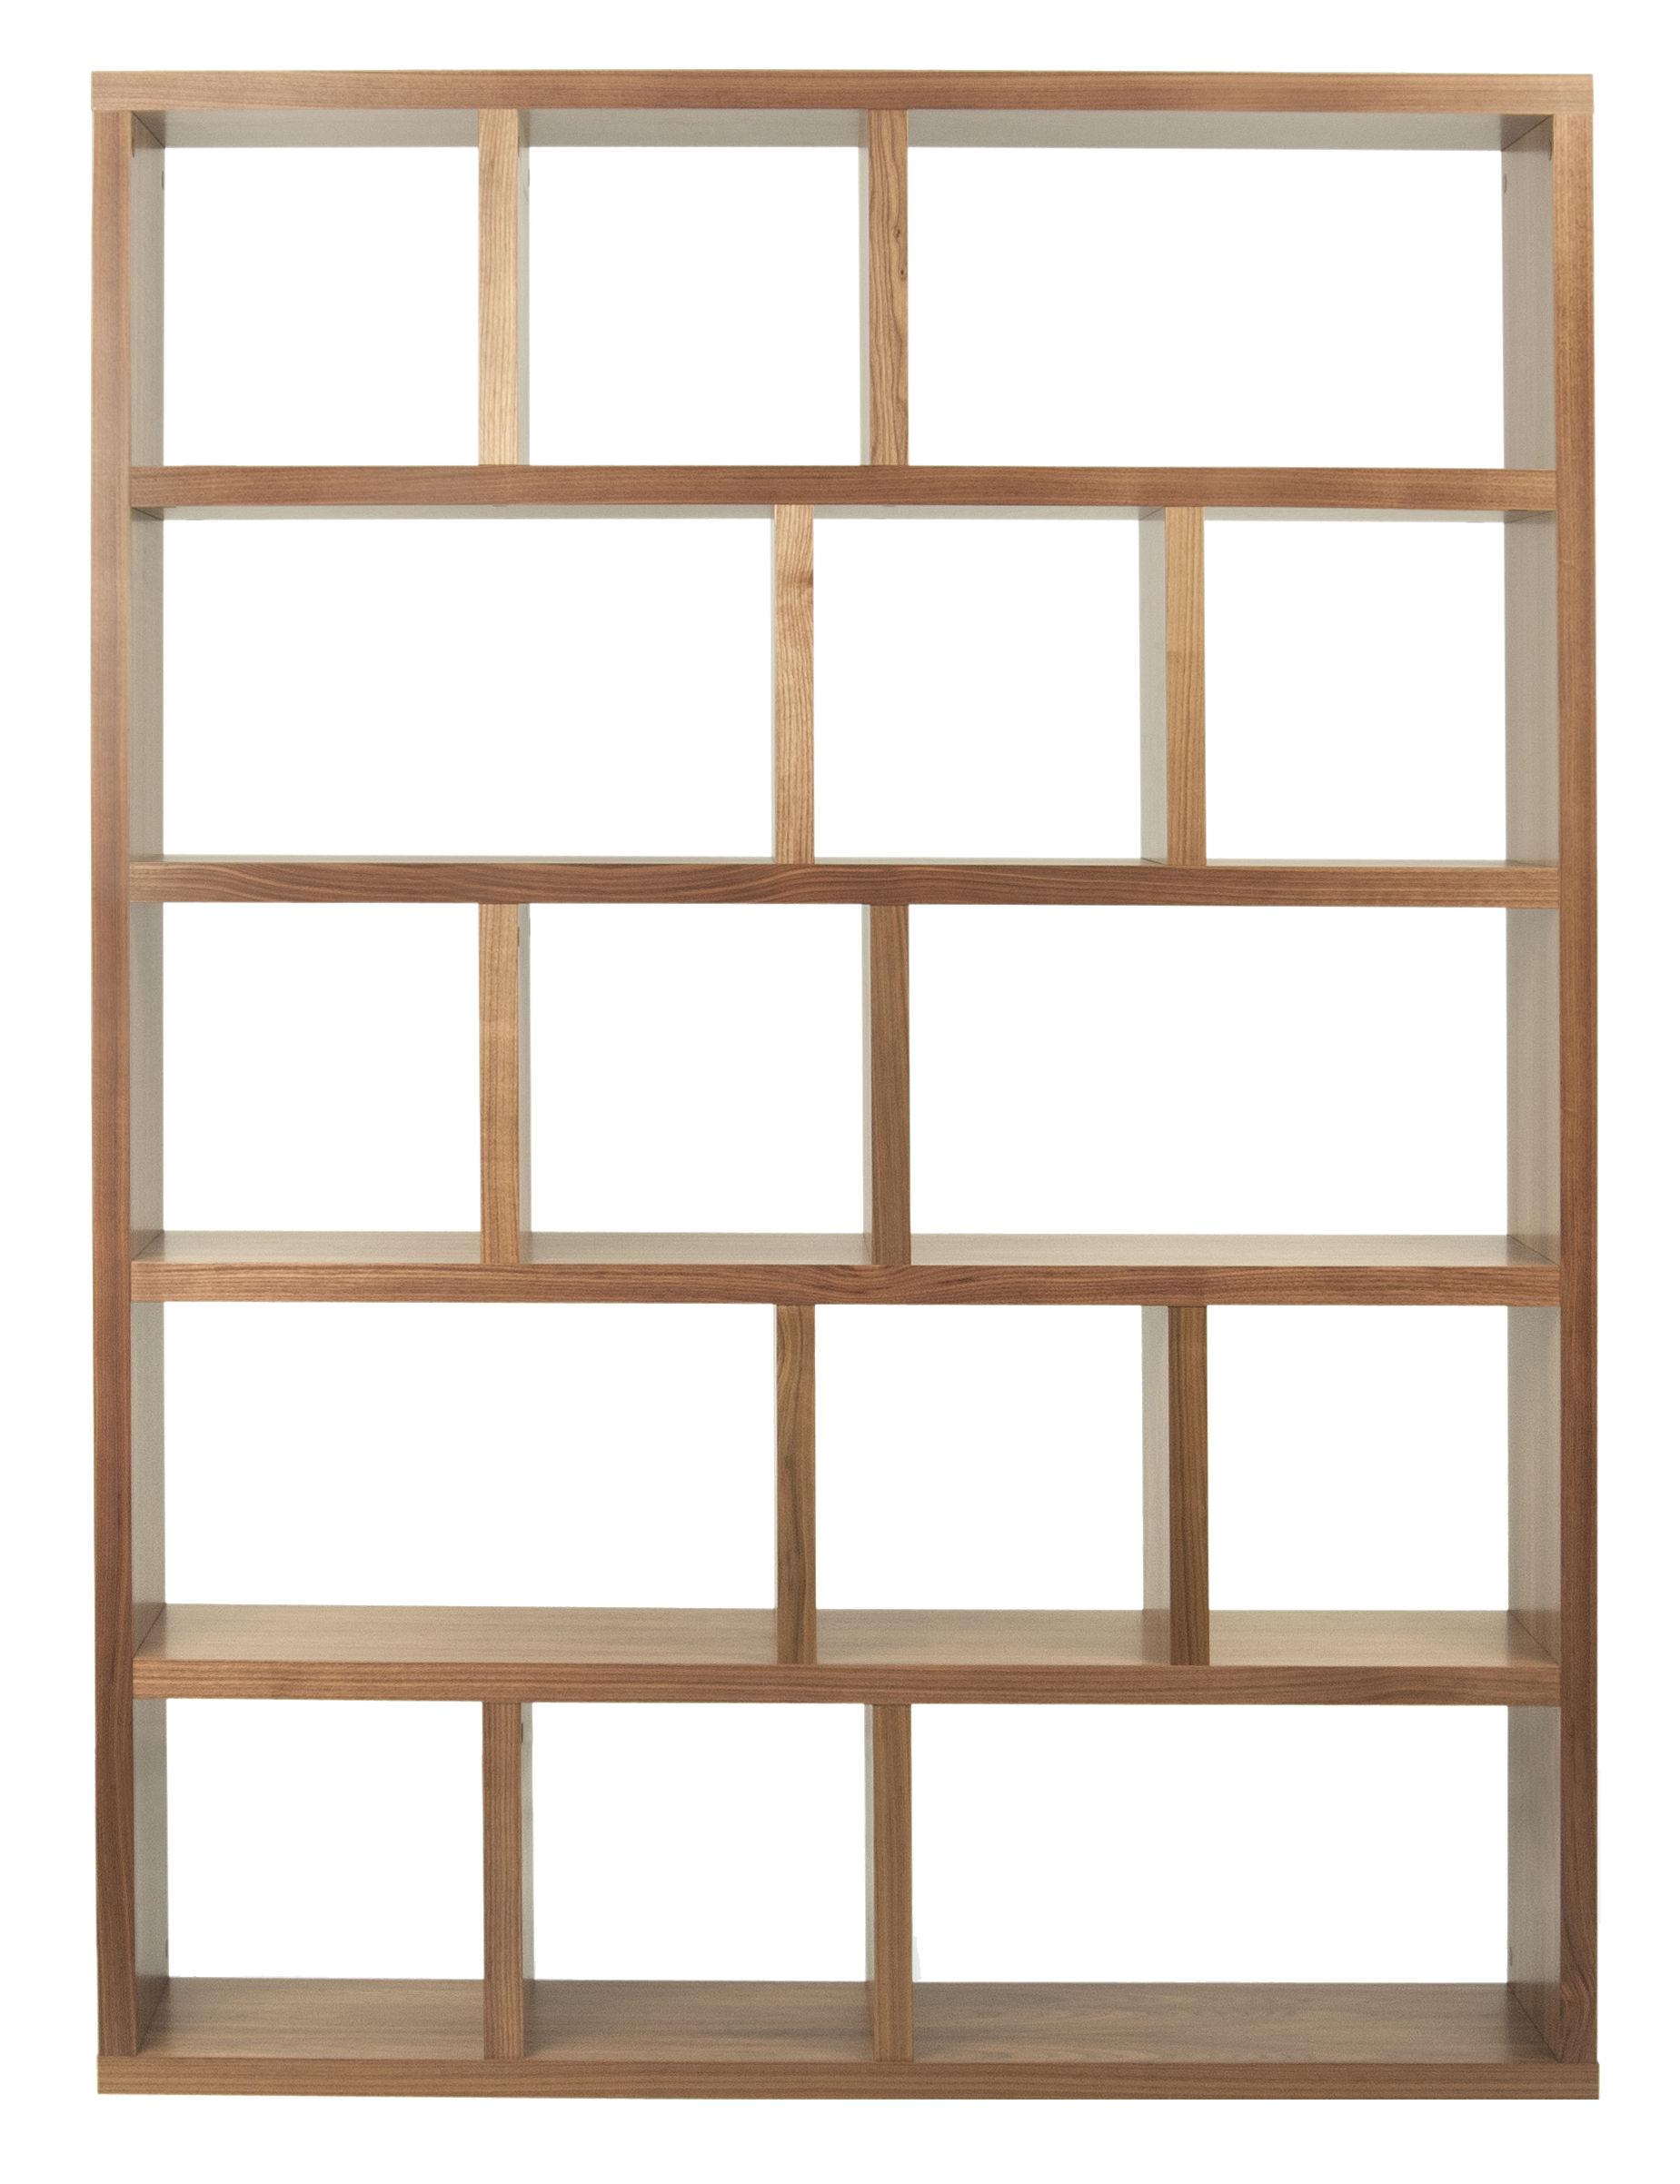 Furniture - Bookcases & Bookshelves - Rotterdam Bookcase - L 150 x H 198 cm by POP UP HOME - Walnut - Walnut-veneered honeycomb panels